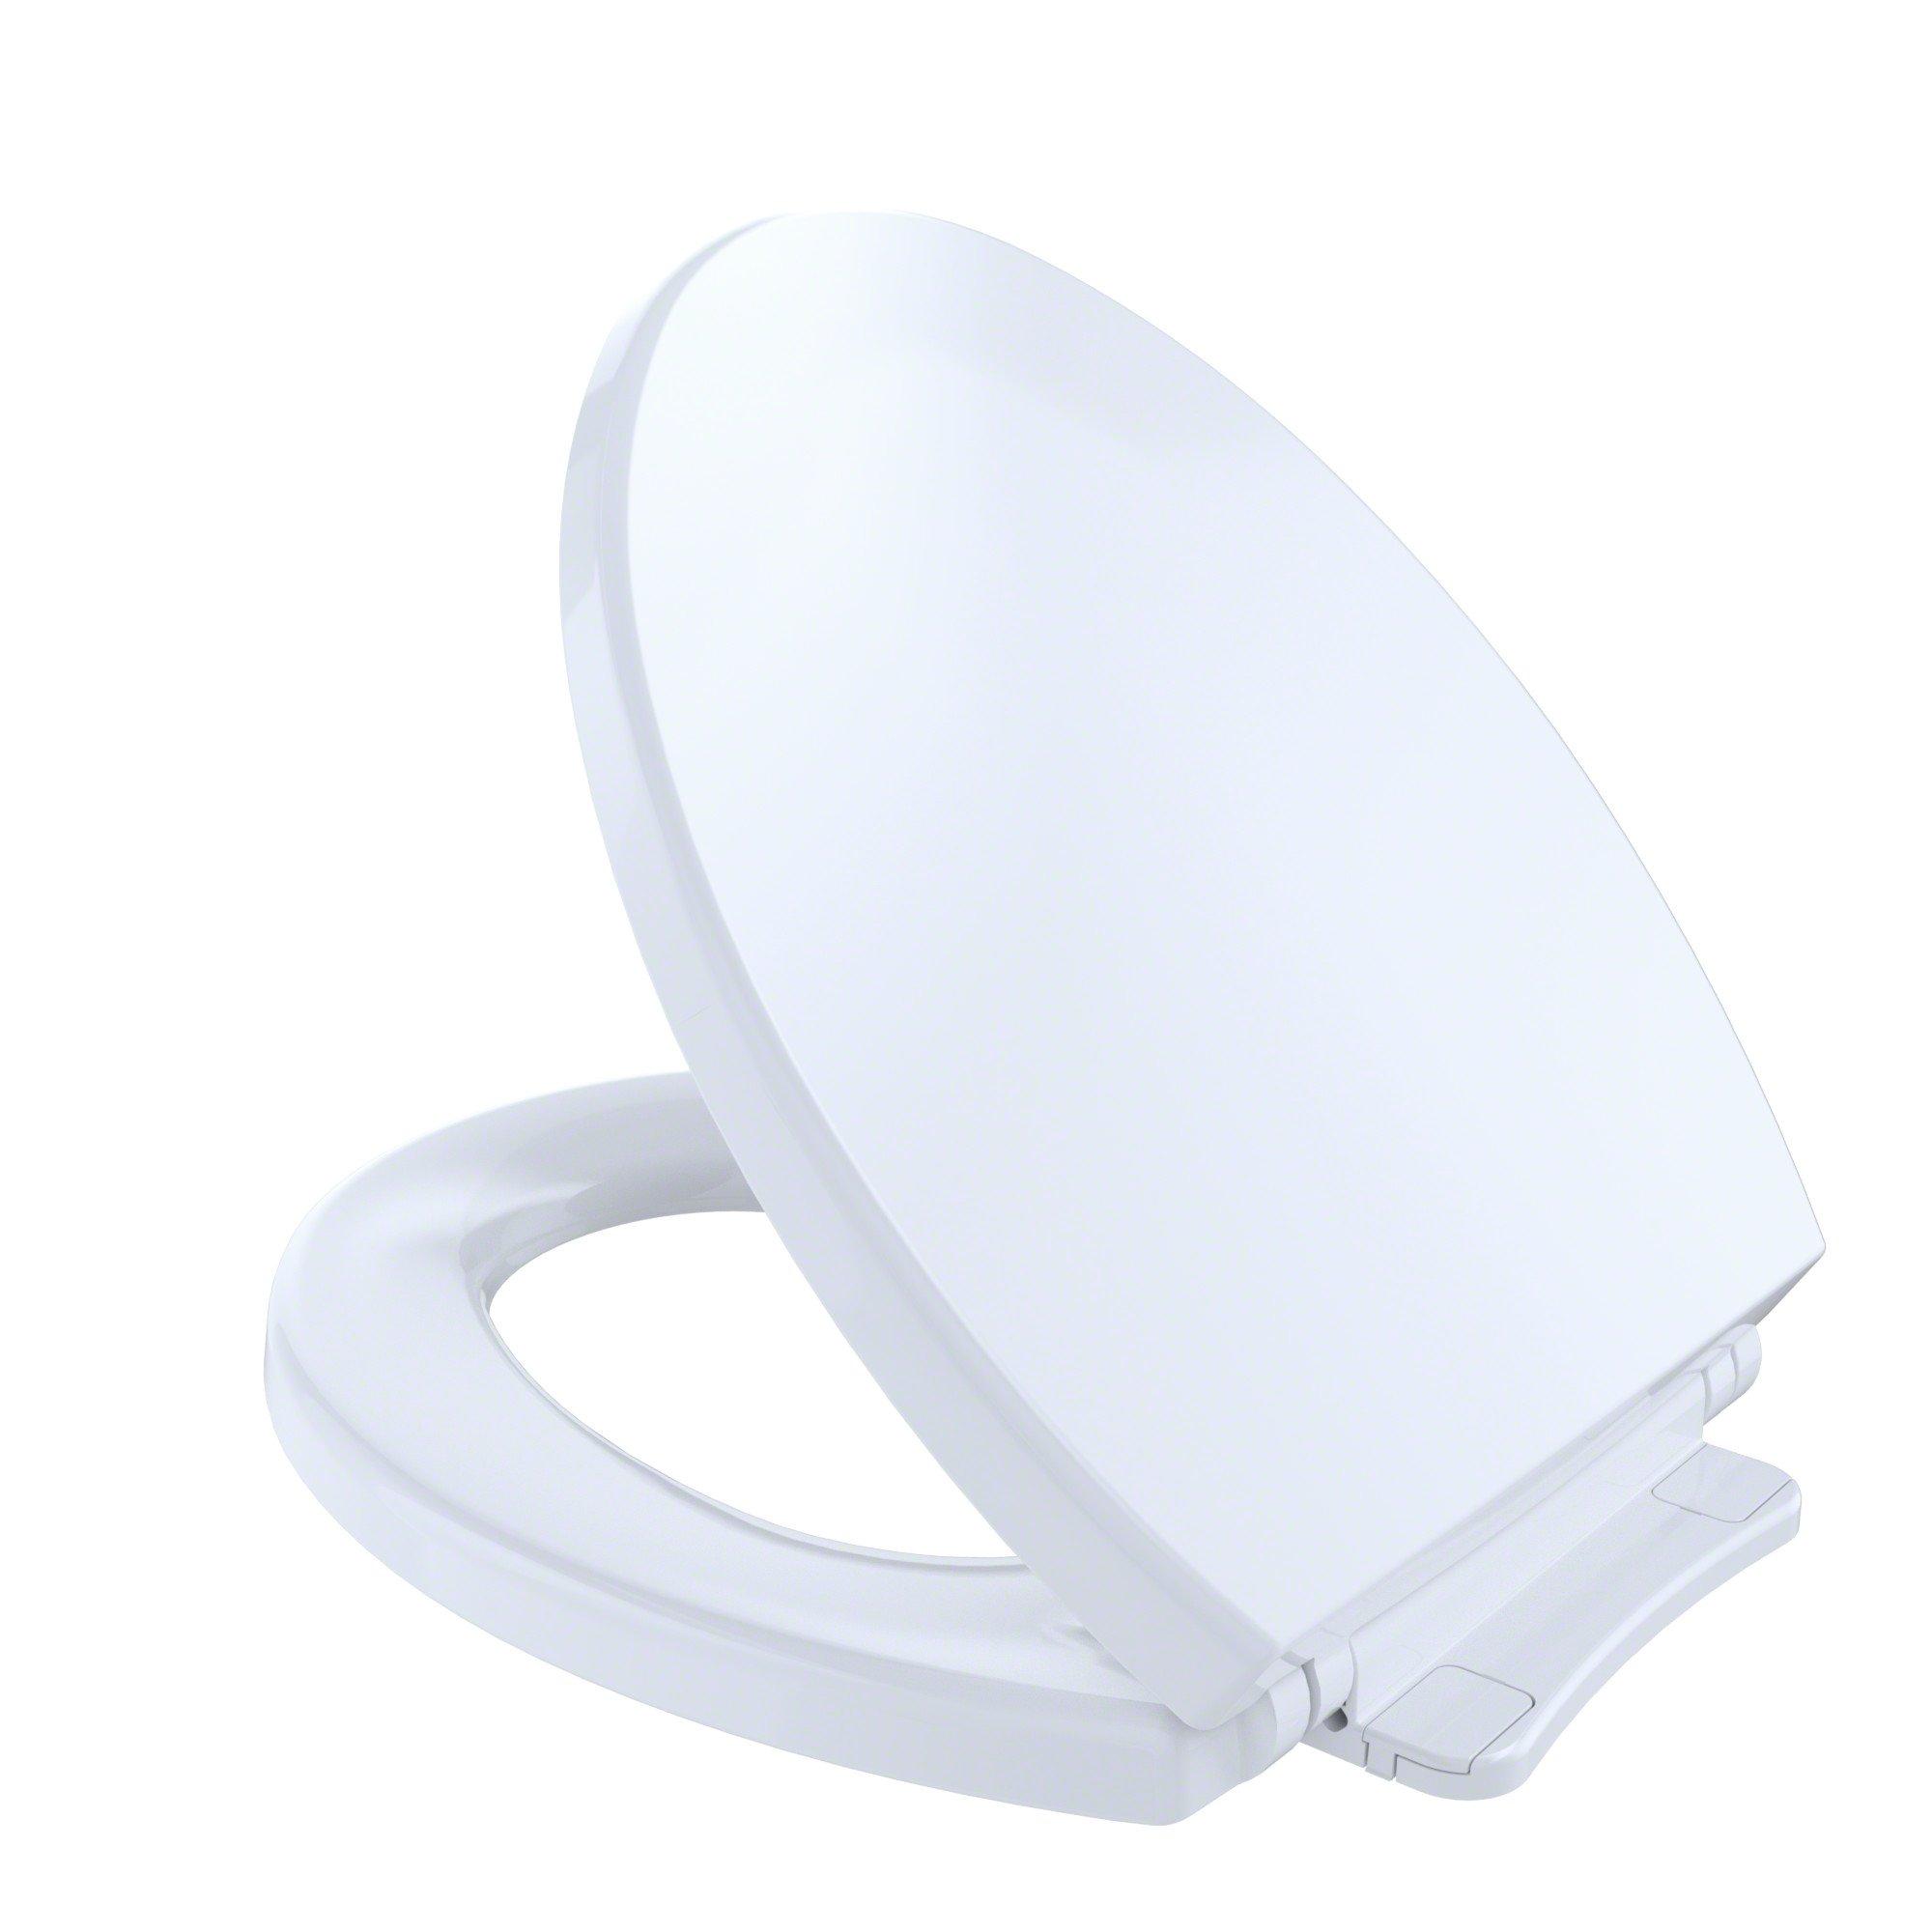 TOTO SS113#01 Transitional SoftClose Round Toilet Seat, Cotton White